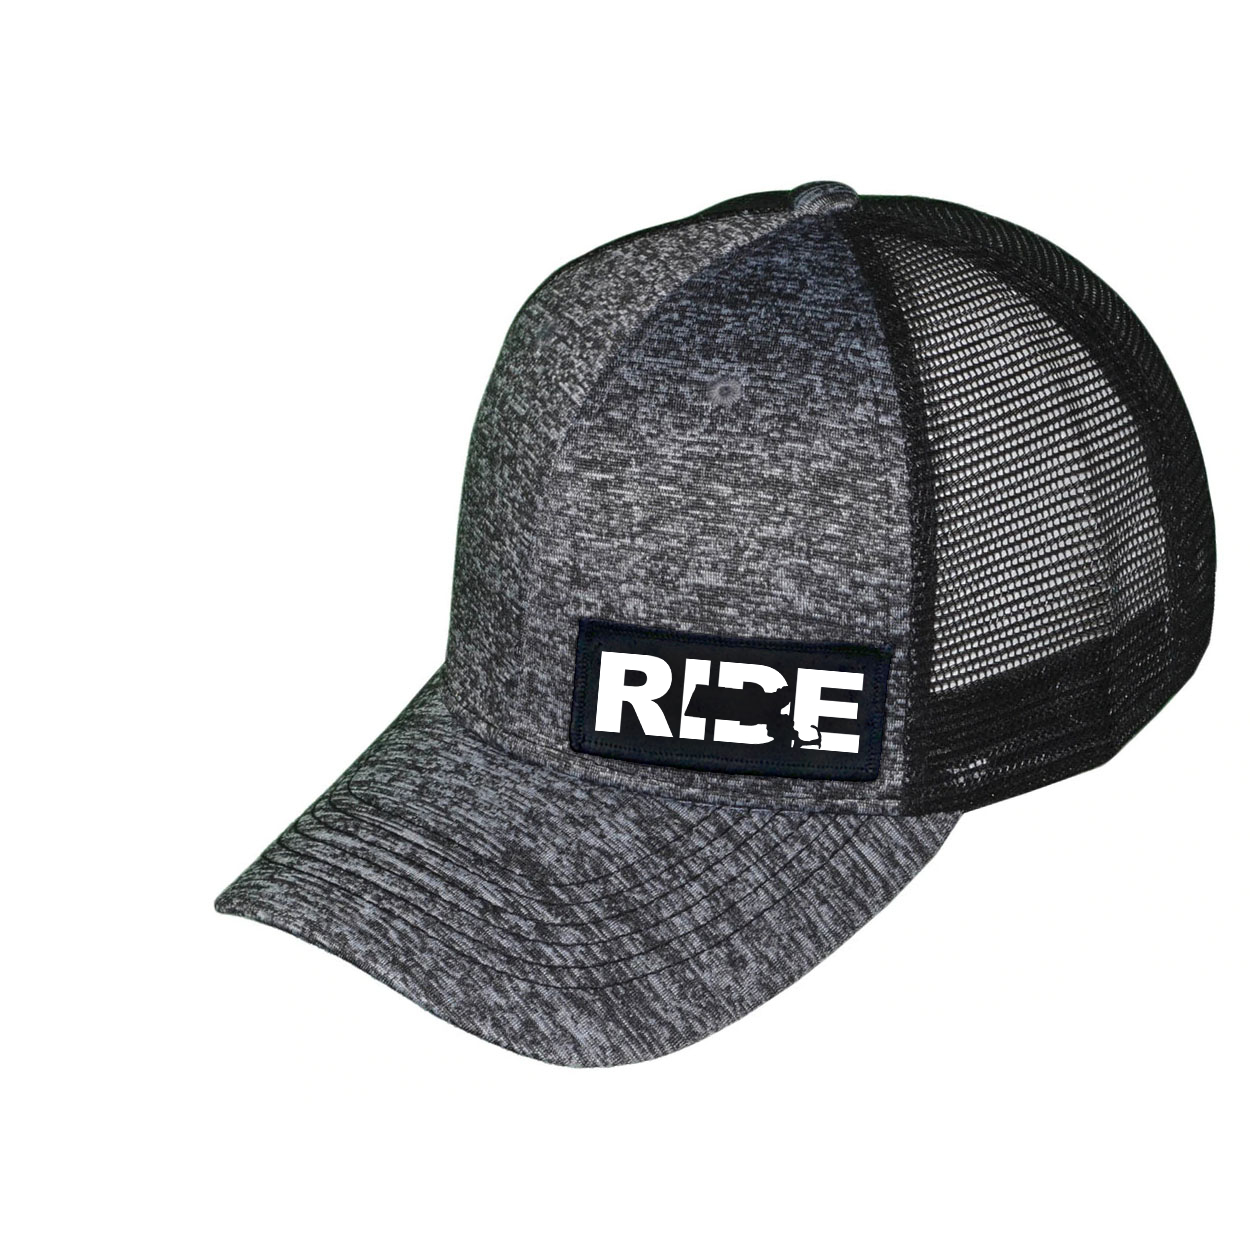 Ride Massachusetts Night Out Woven Patch Melange Snapback Trucker Hat Gray/Black (White Logo)